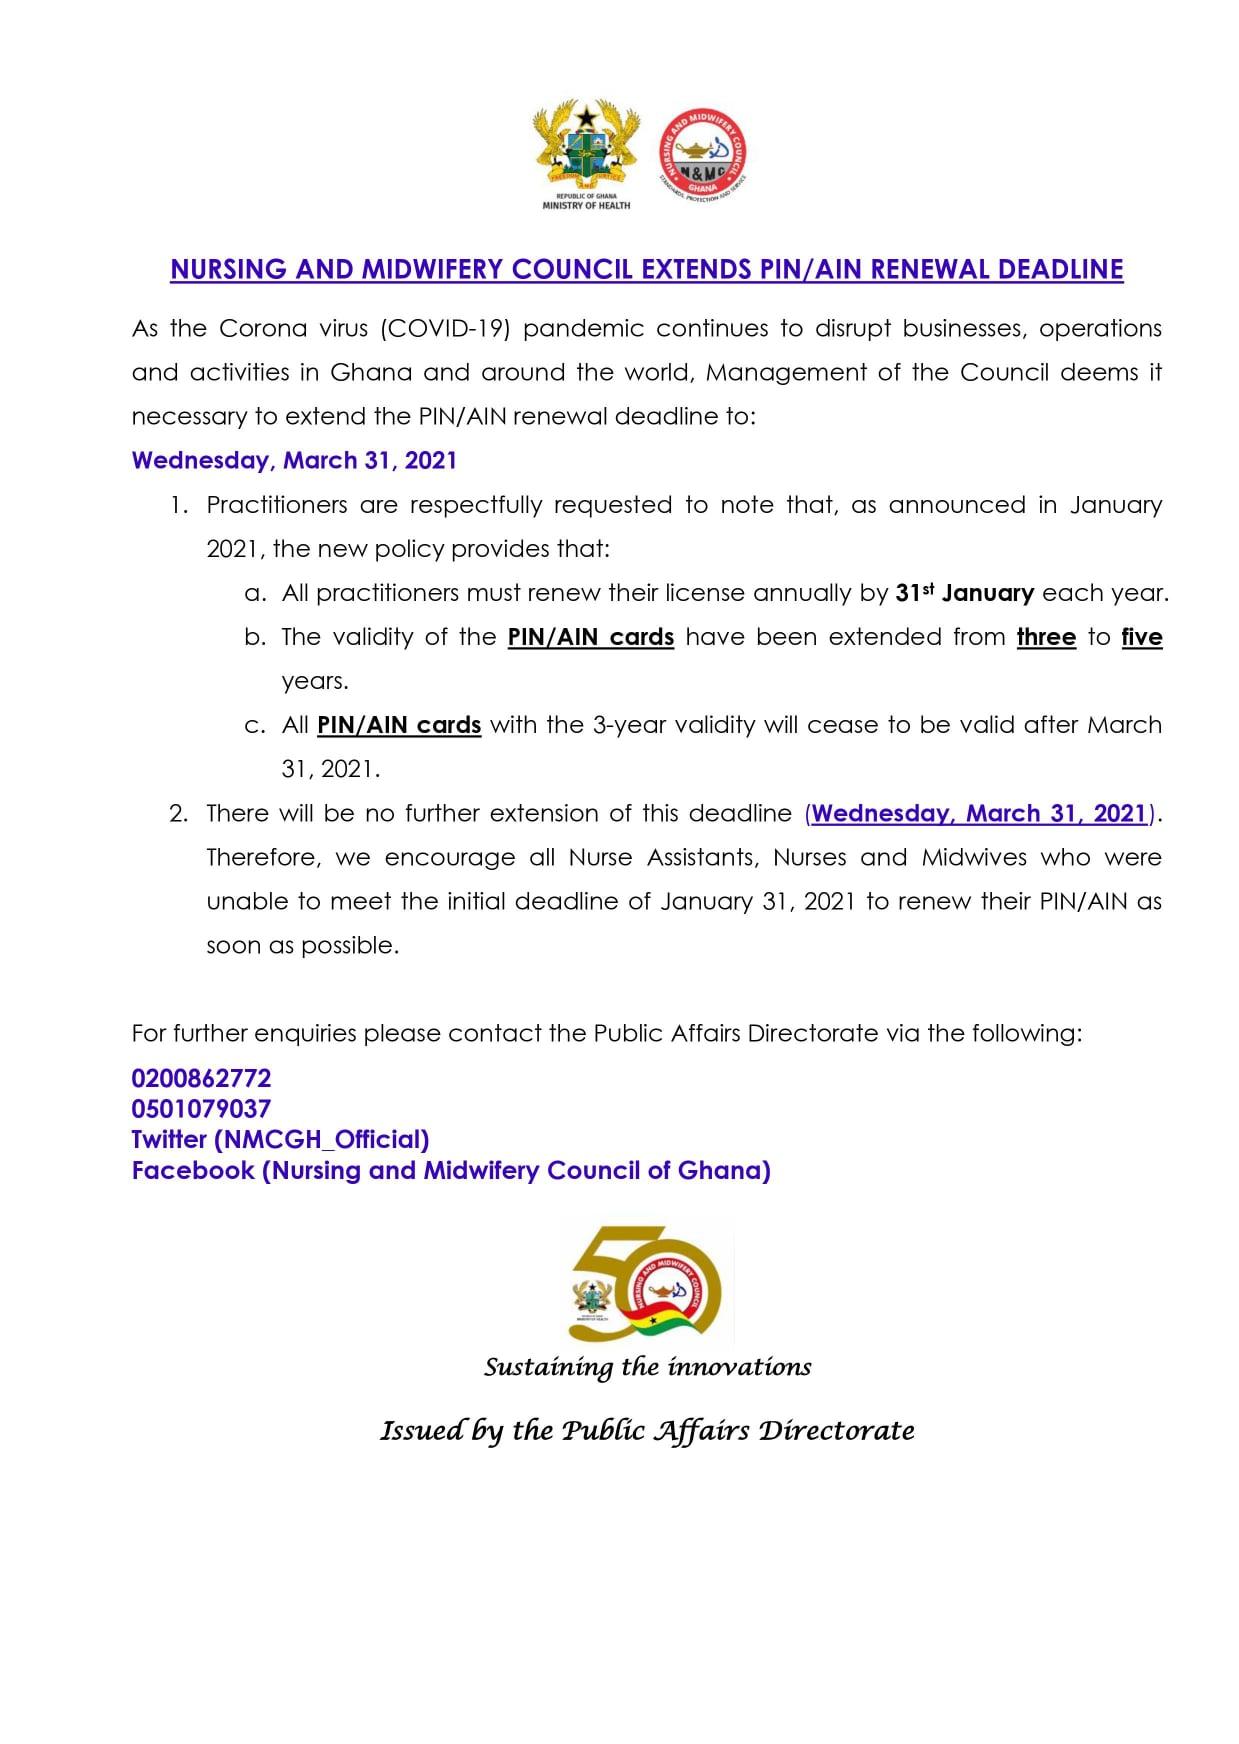 NMC Ghana PIN & AIN Renewal Guidelines & Deadline 2021